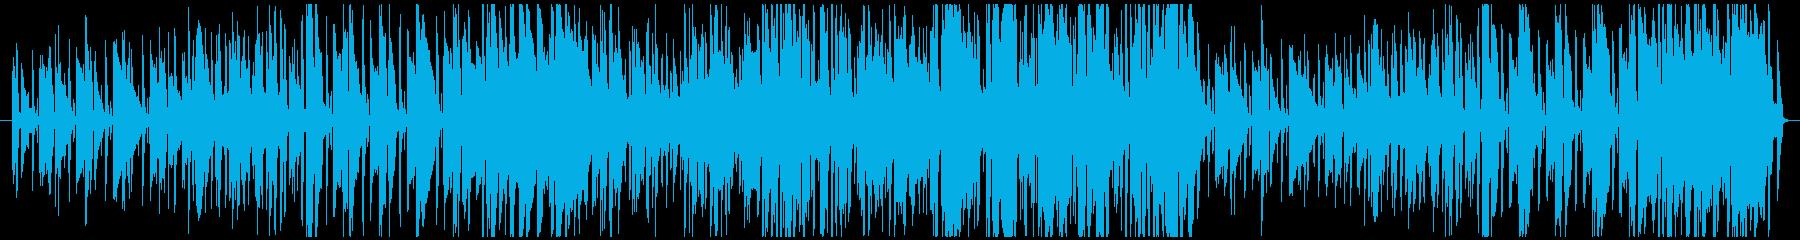 Somedayの再生済みの波形